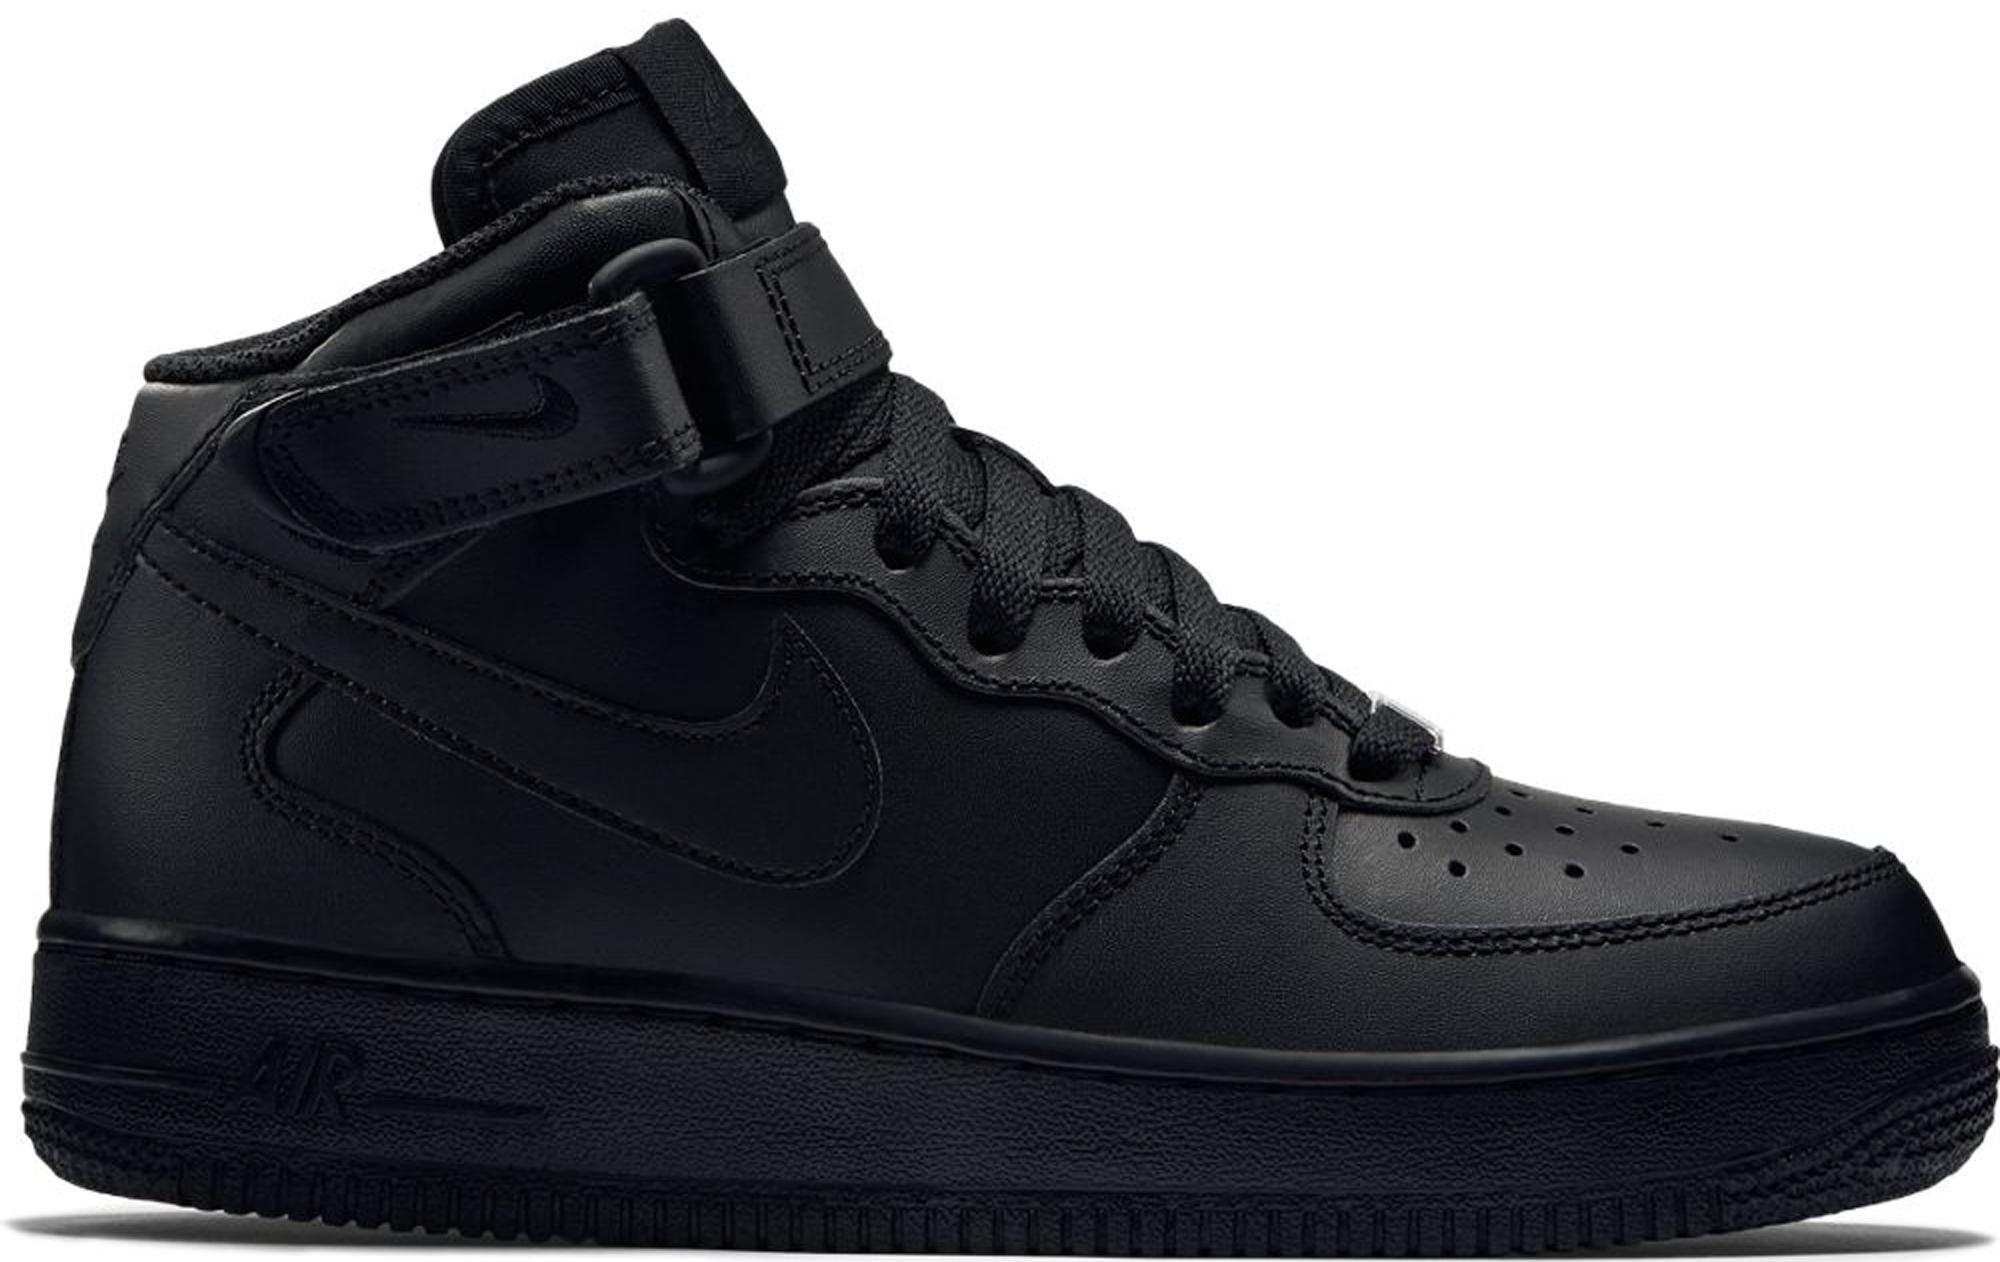 Nike Air Force 1 Mid Black 2014 (GS